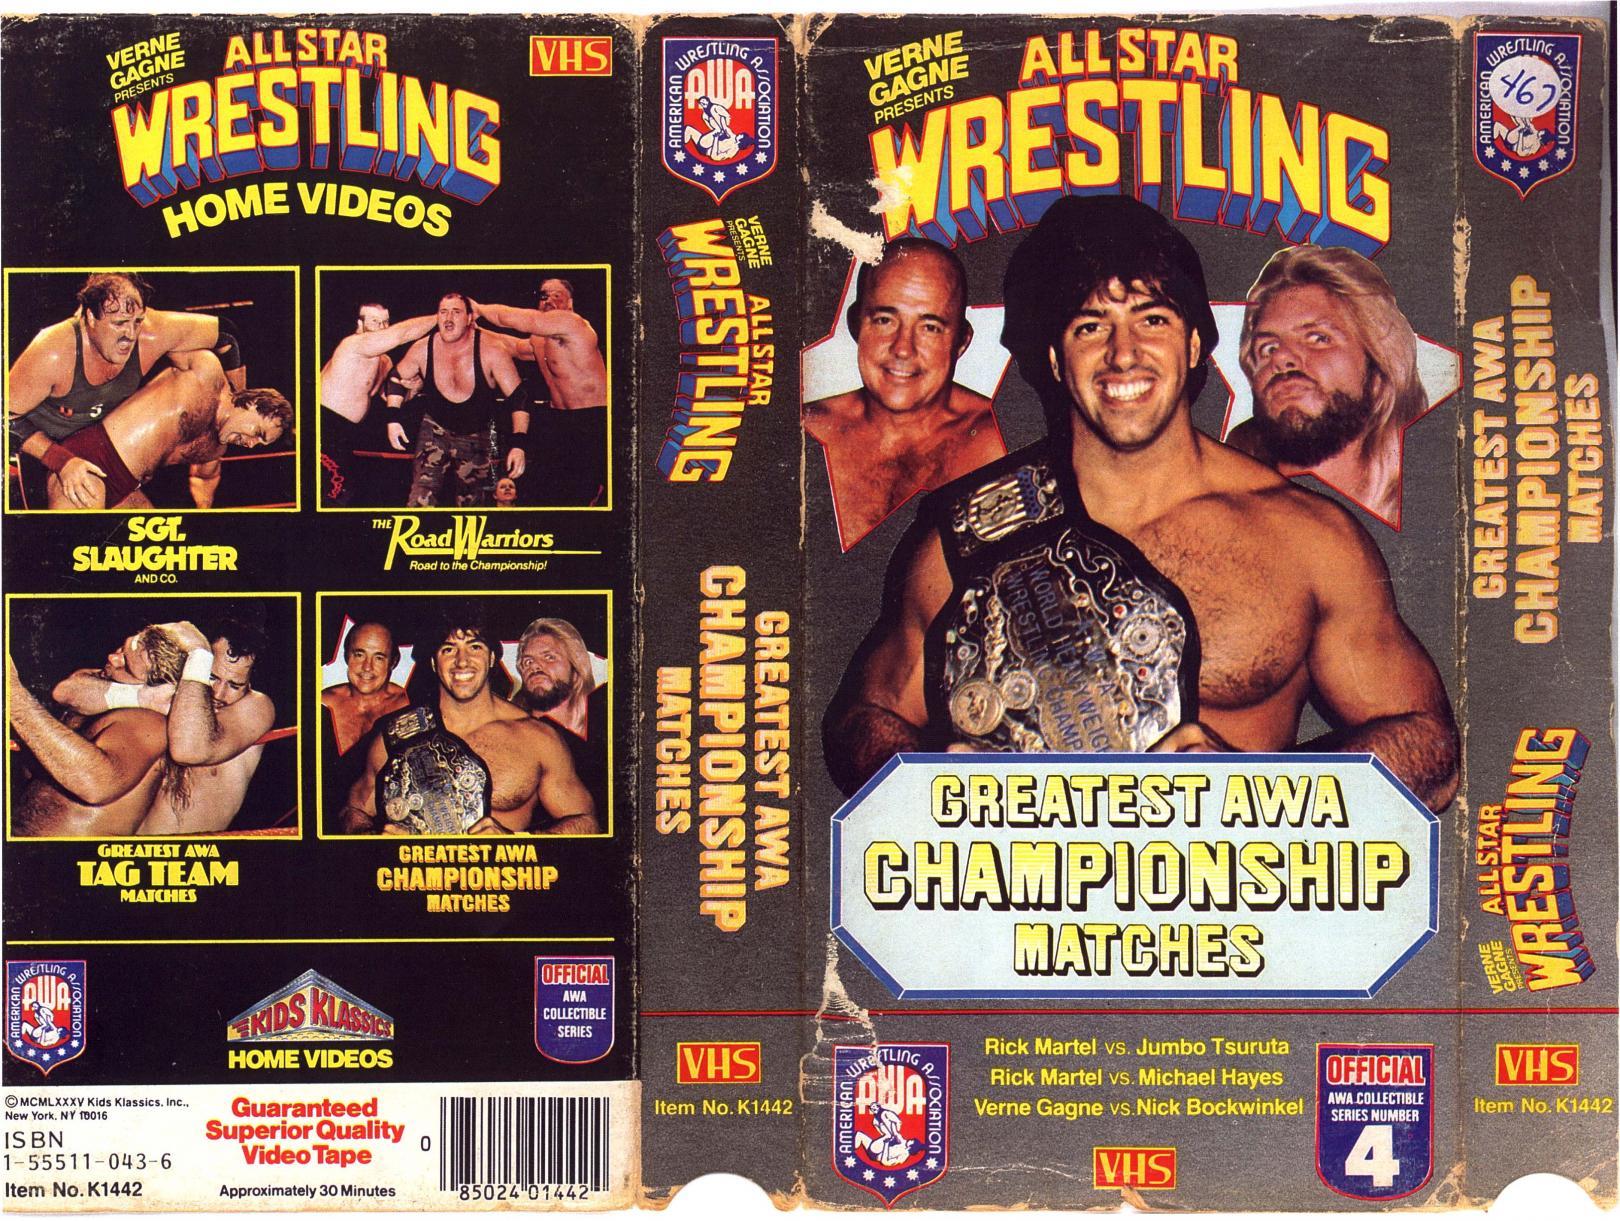 All_Star_Wrestling_Greatest_AWA_Championship_Matches